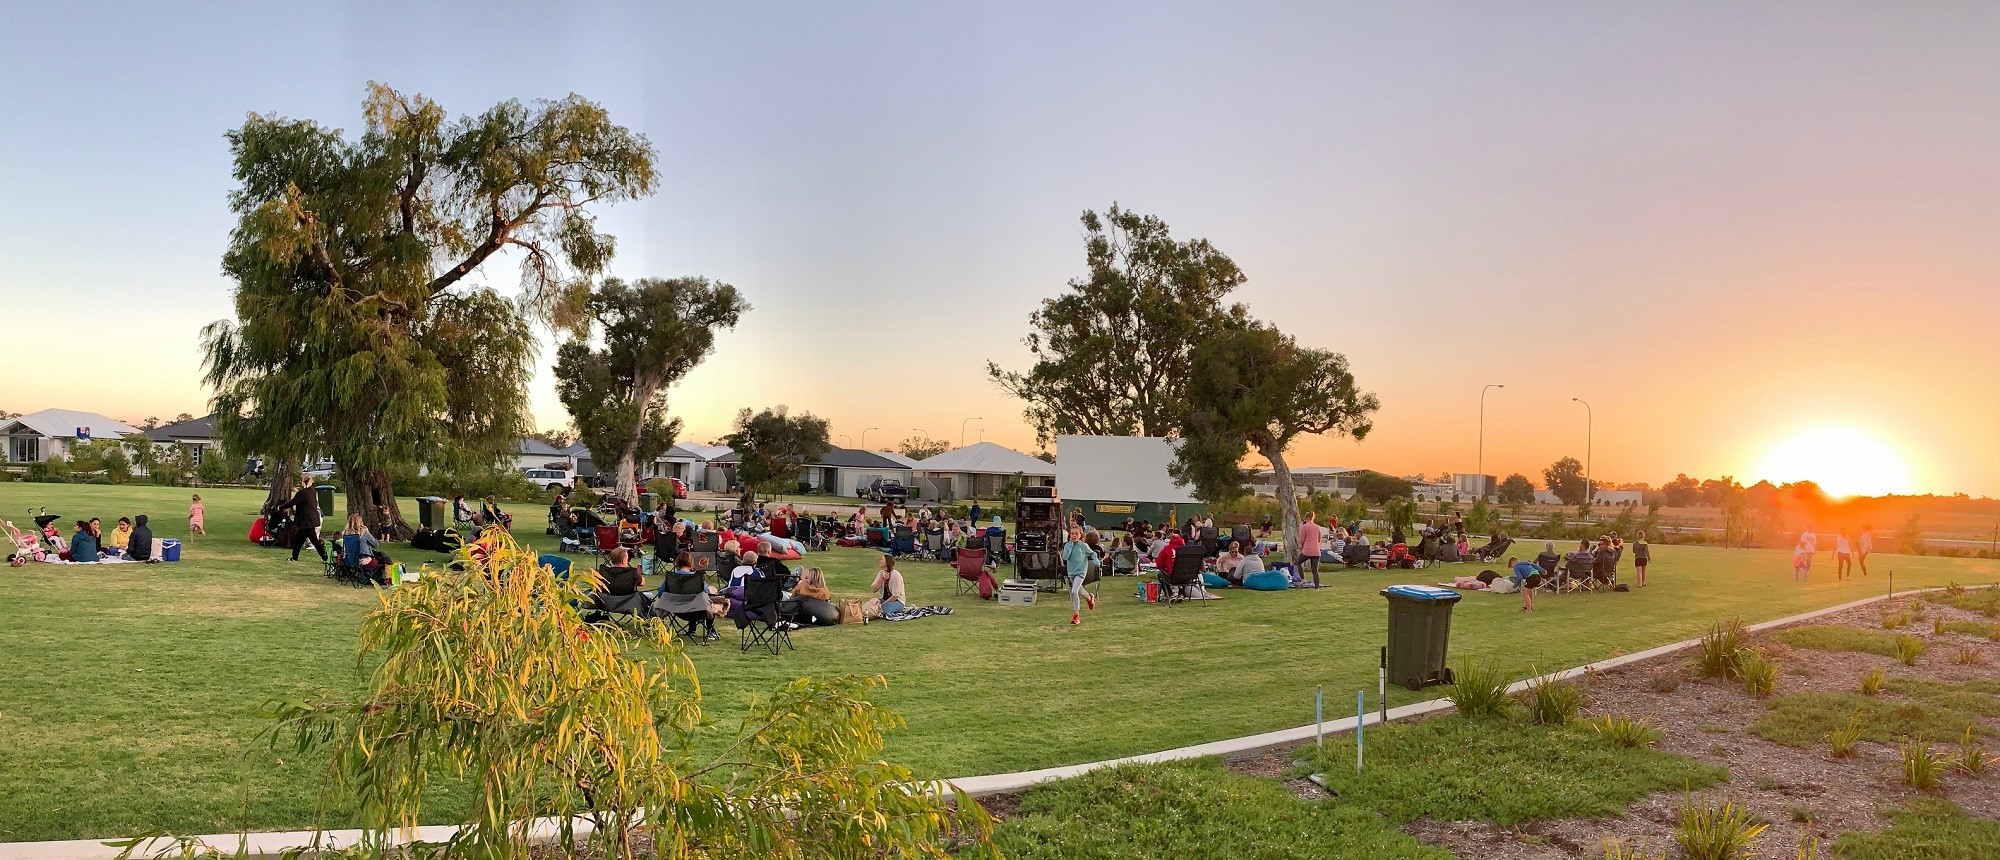 vasse-estate-land-for-sale-outdoor-cinema-community-2000x860